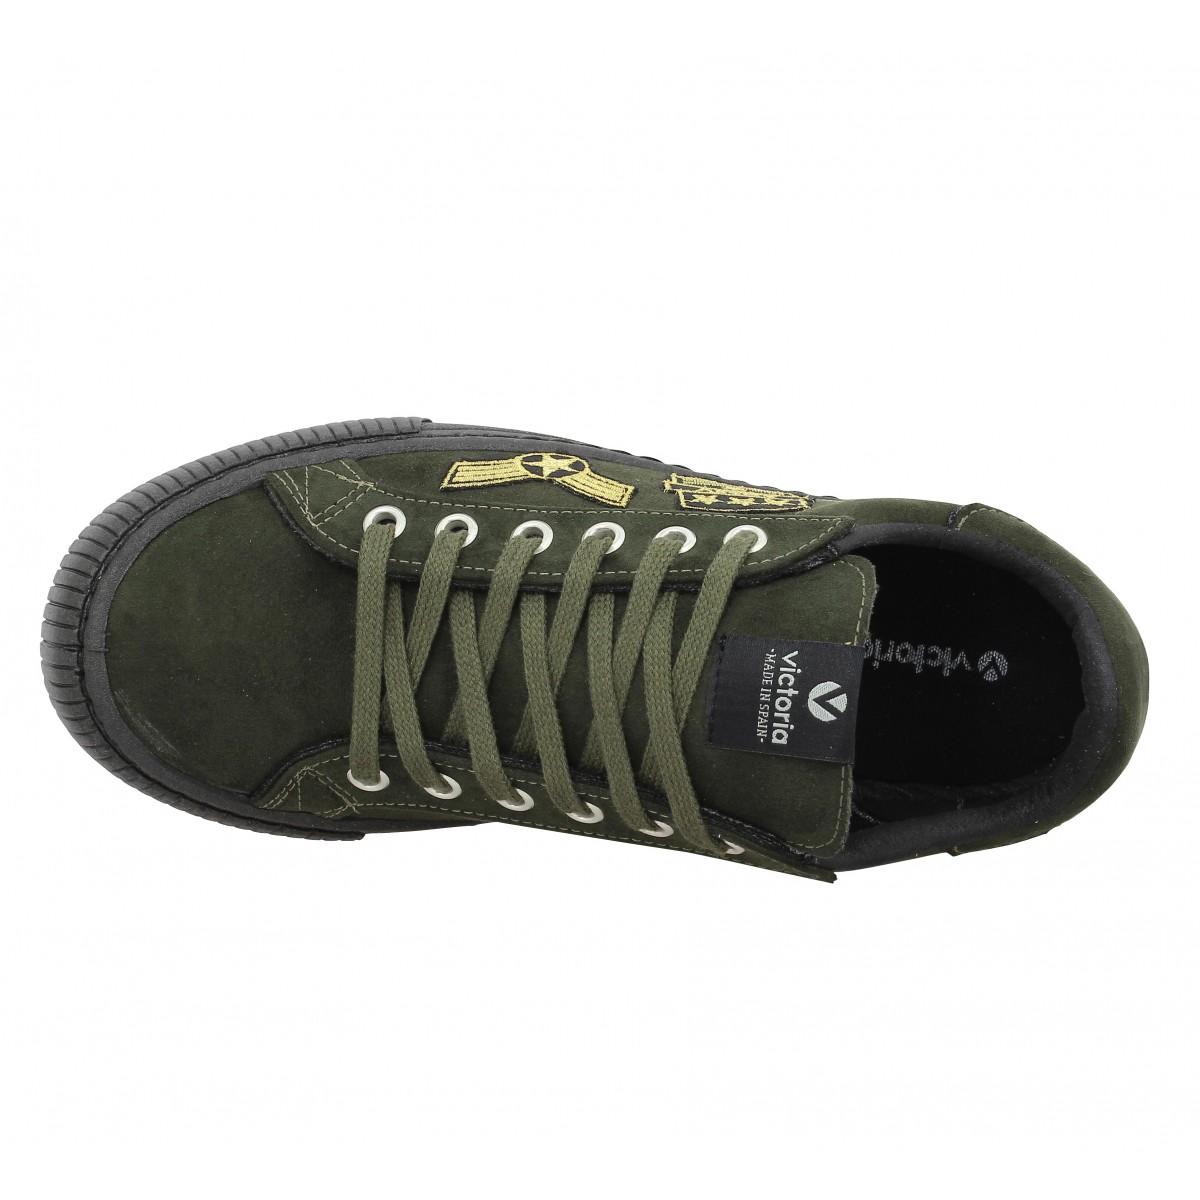 Chaussures Victoria 11651 suede femme kaki femme | Fanny